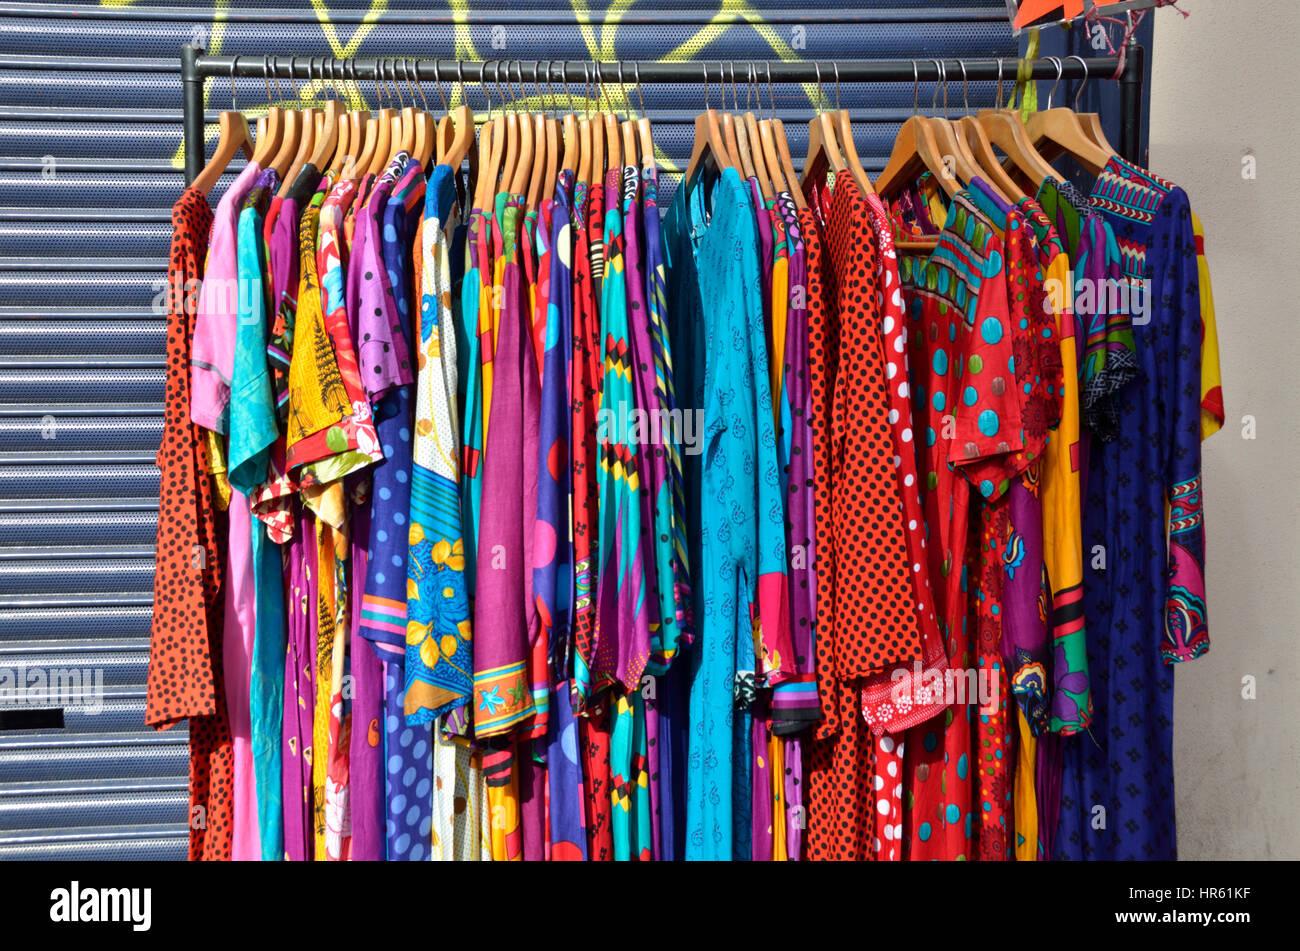 e815ad9c3f Indian sari dresses on display outside a shop Stock Photo: 134742707 ...